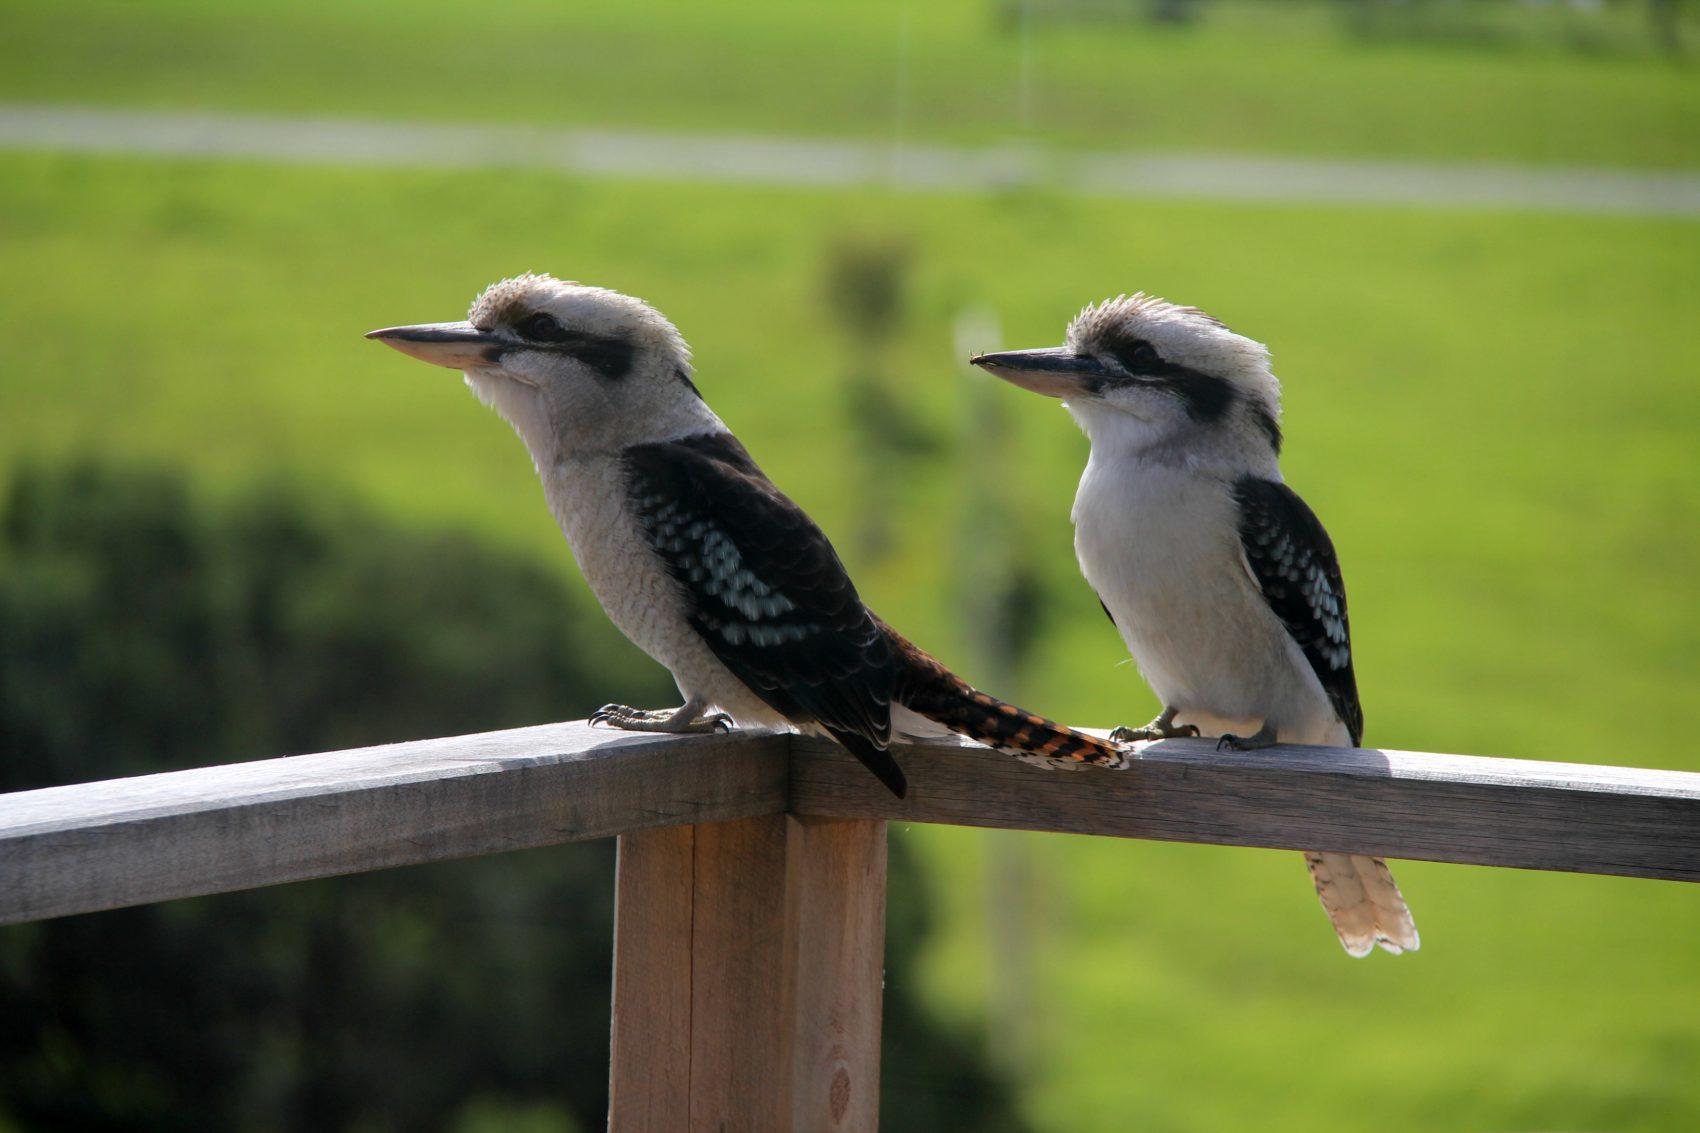 Friendly kookaburras sitting on balcony in Mallacoota